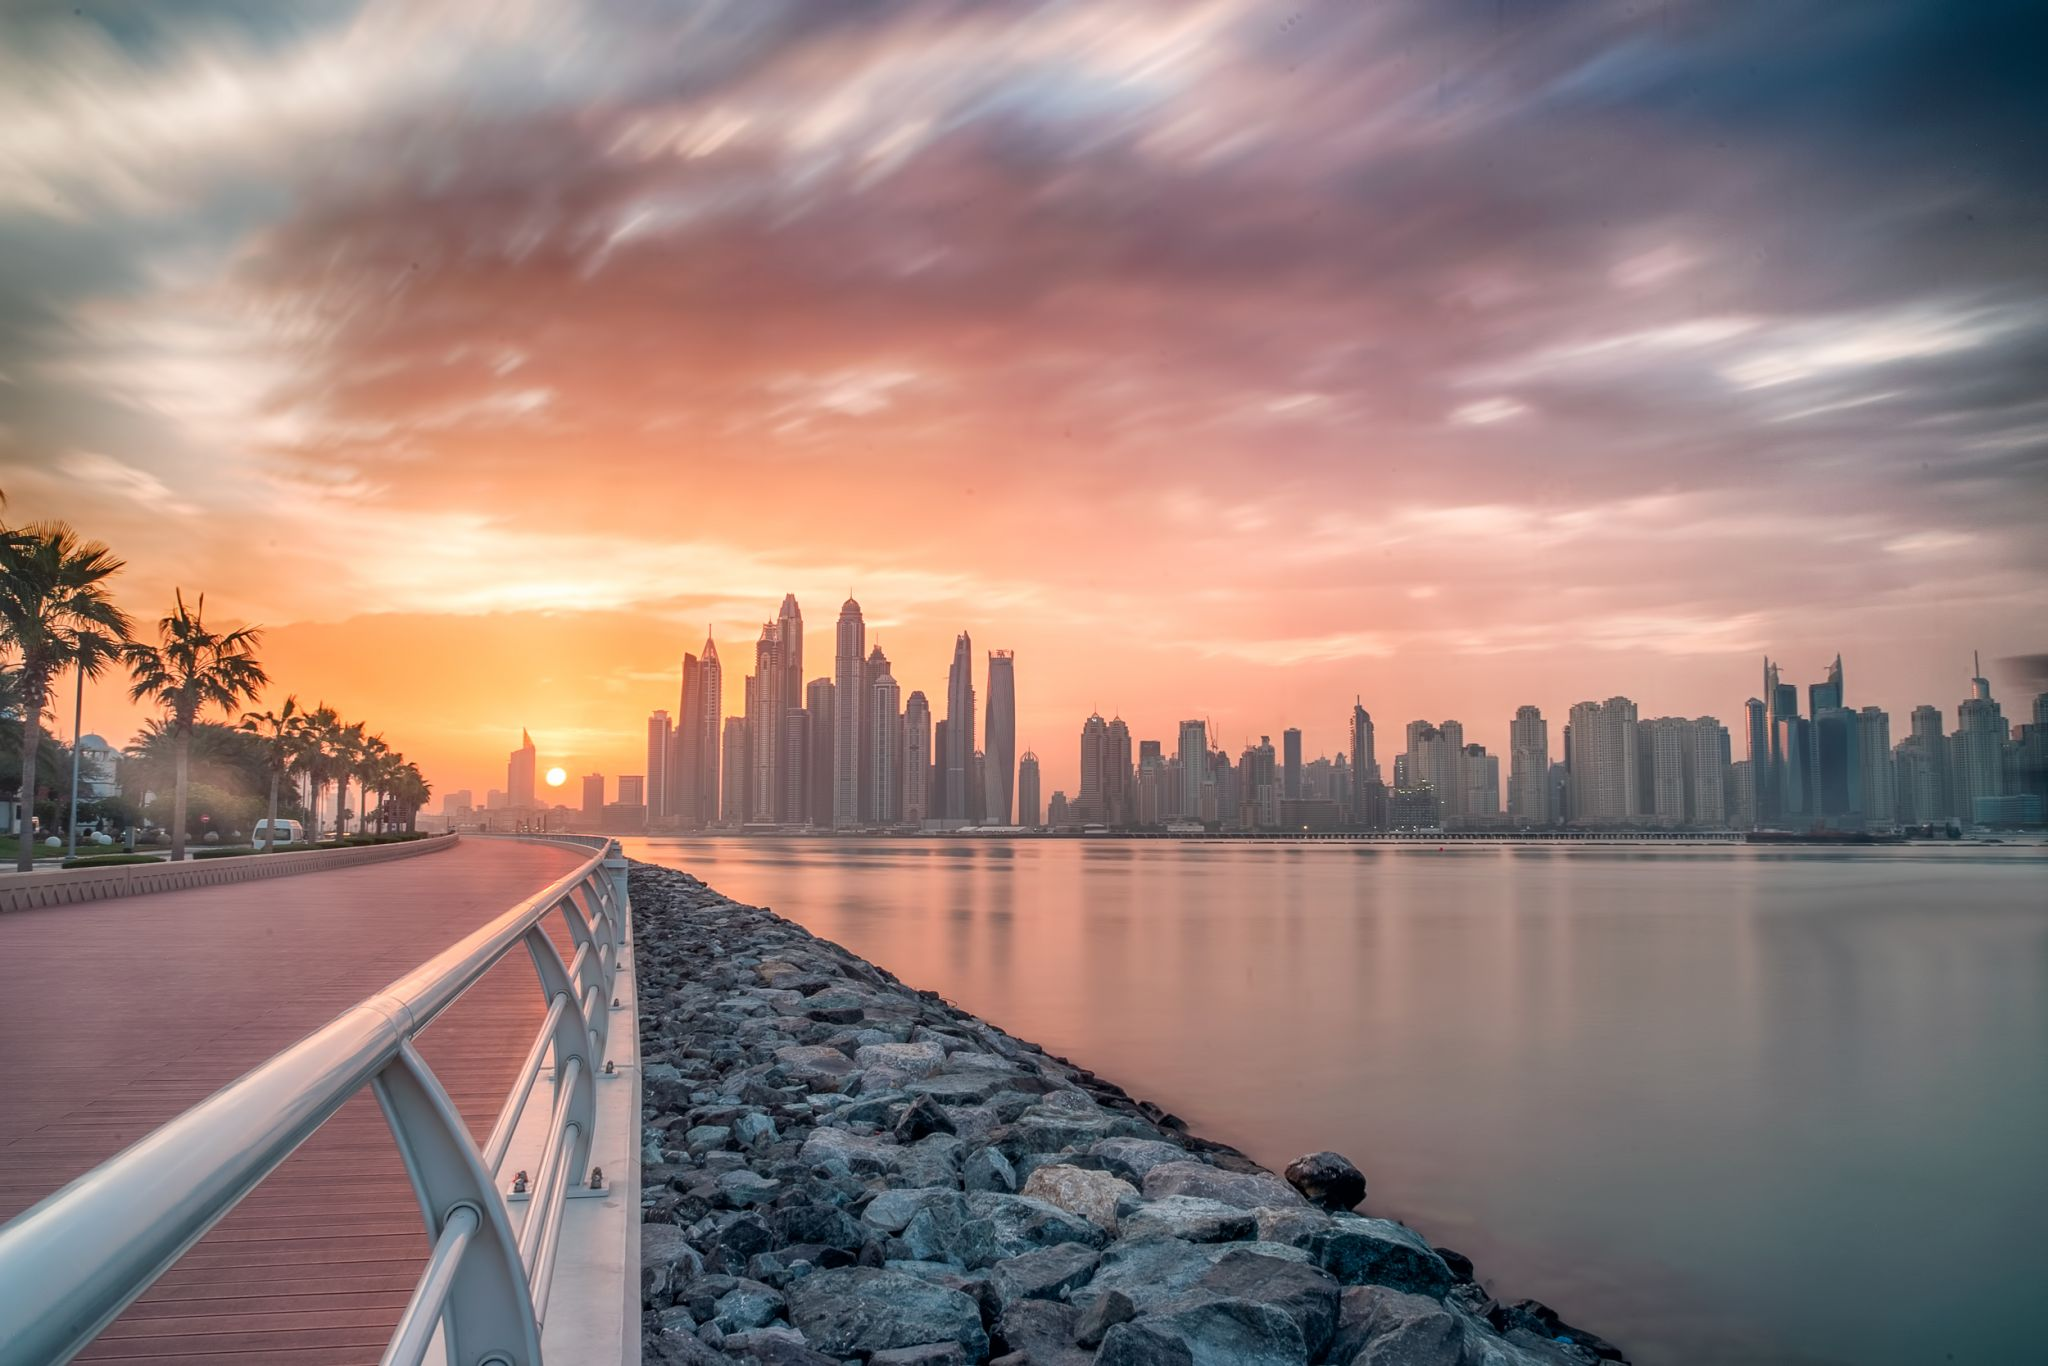 Jumeirah palm west Cresent, United Arab Emirates